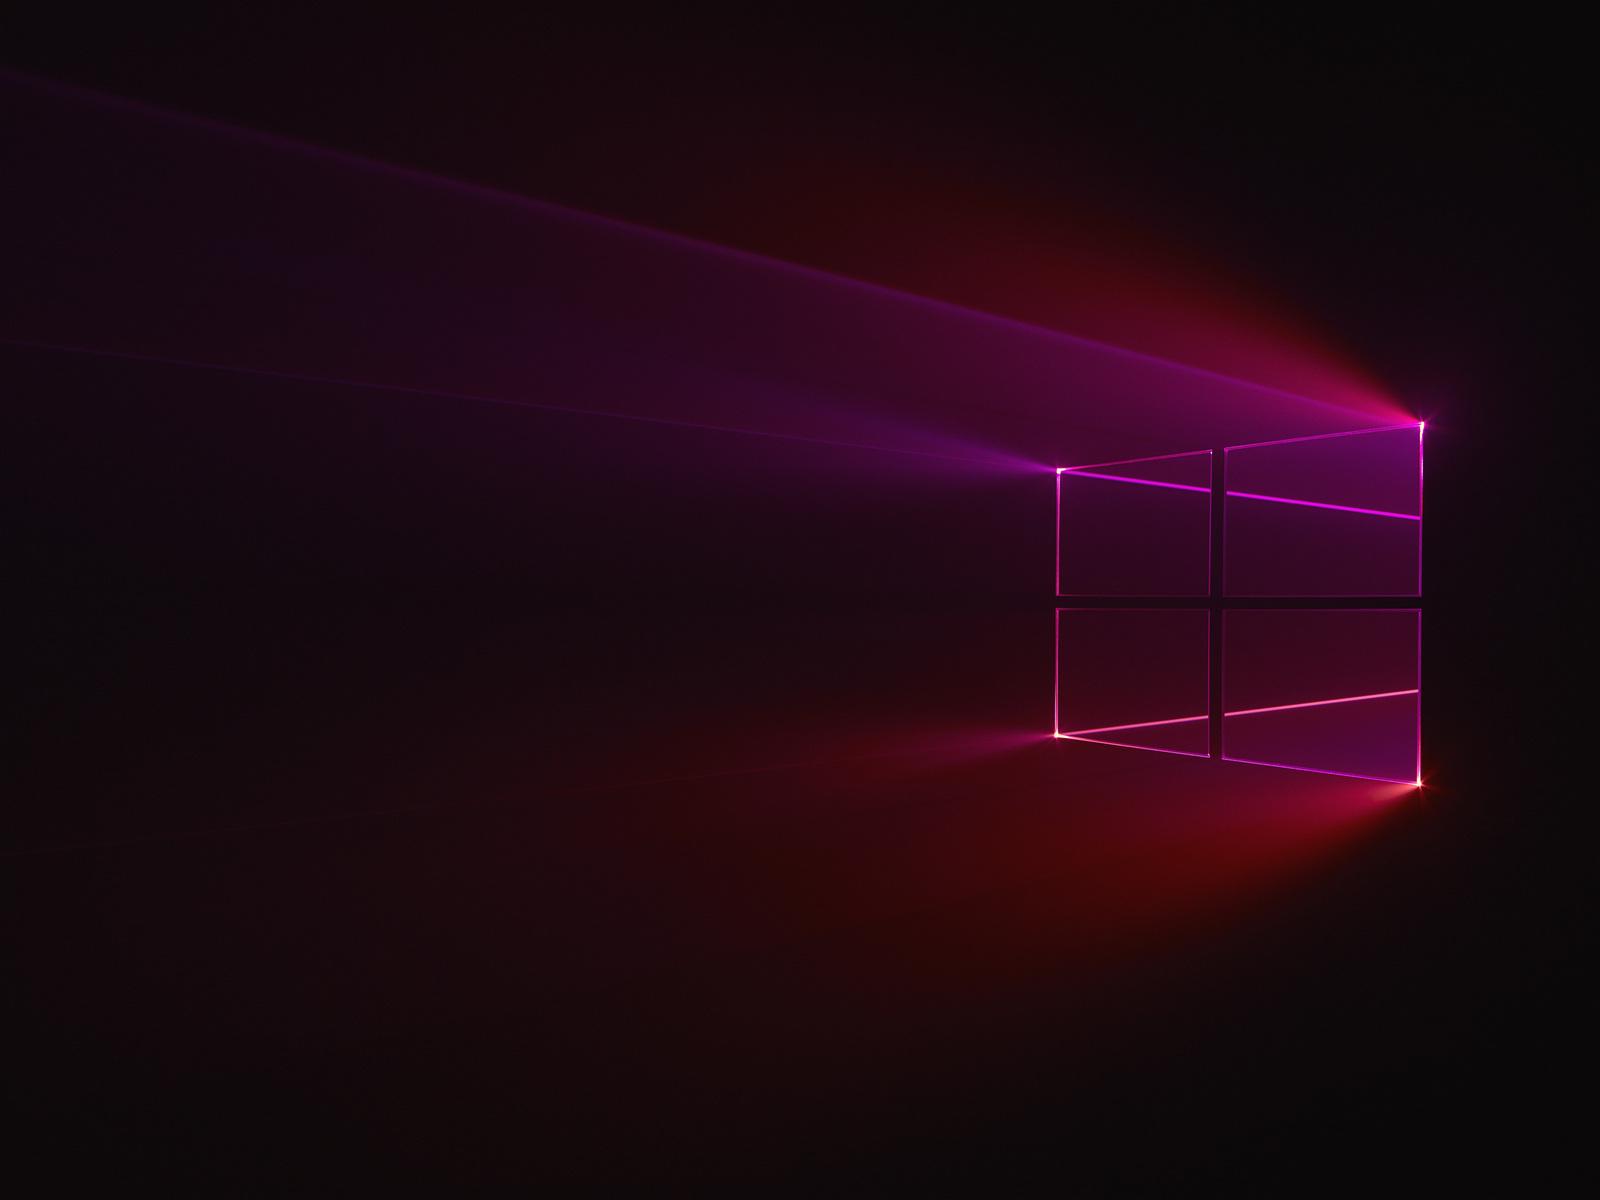 1600x1200 Windows 10 Glass Background 1600x1200 Resolution